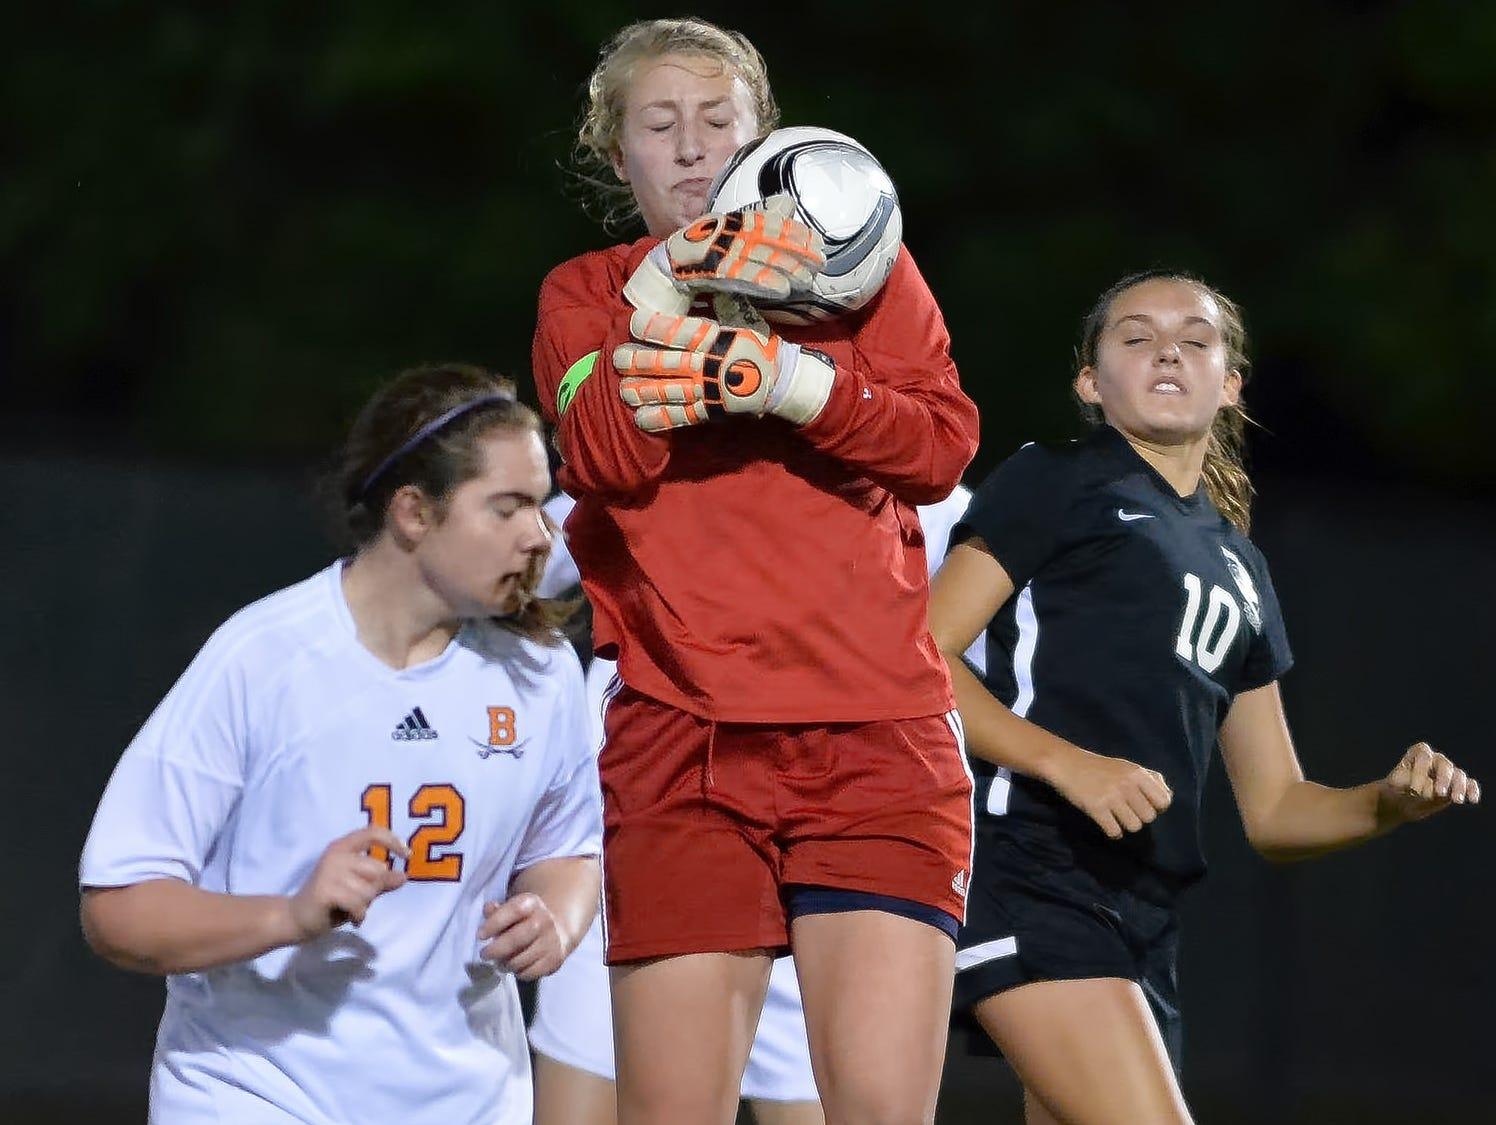 Beech High senior goalkeeper Allie Guinn leaps to gain possession in front of sophomore teammate Sierra Robinson (12) and Station Camp junior McKenzie Polk.